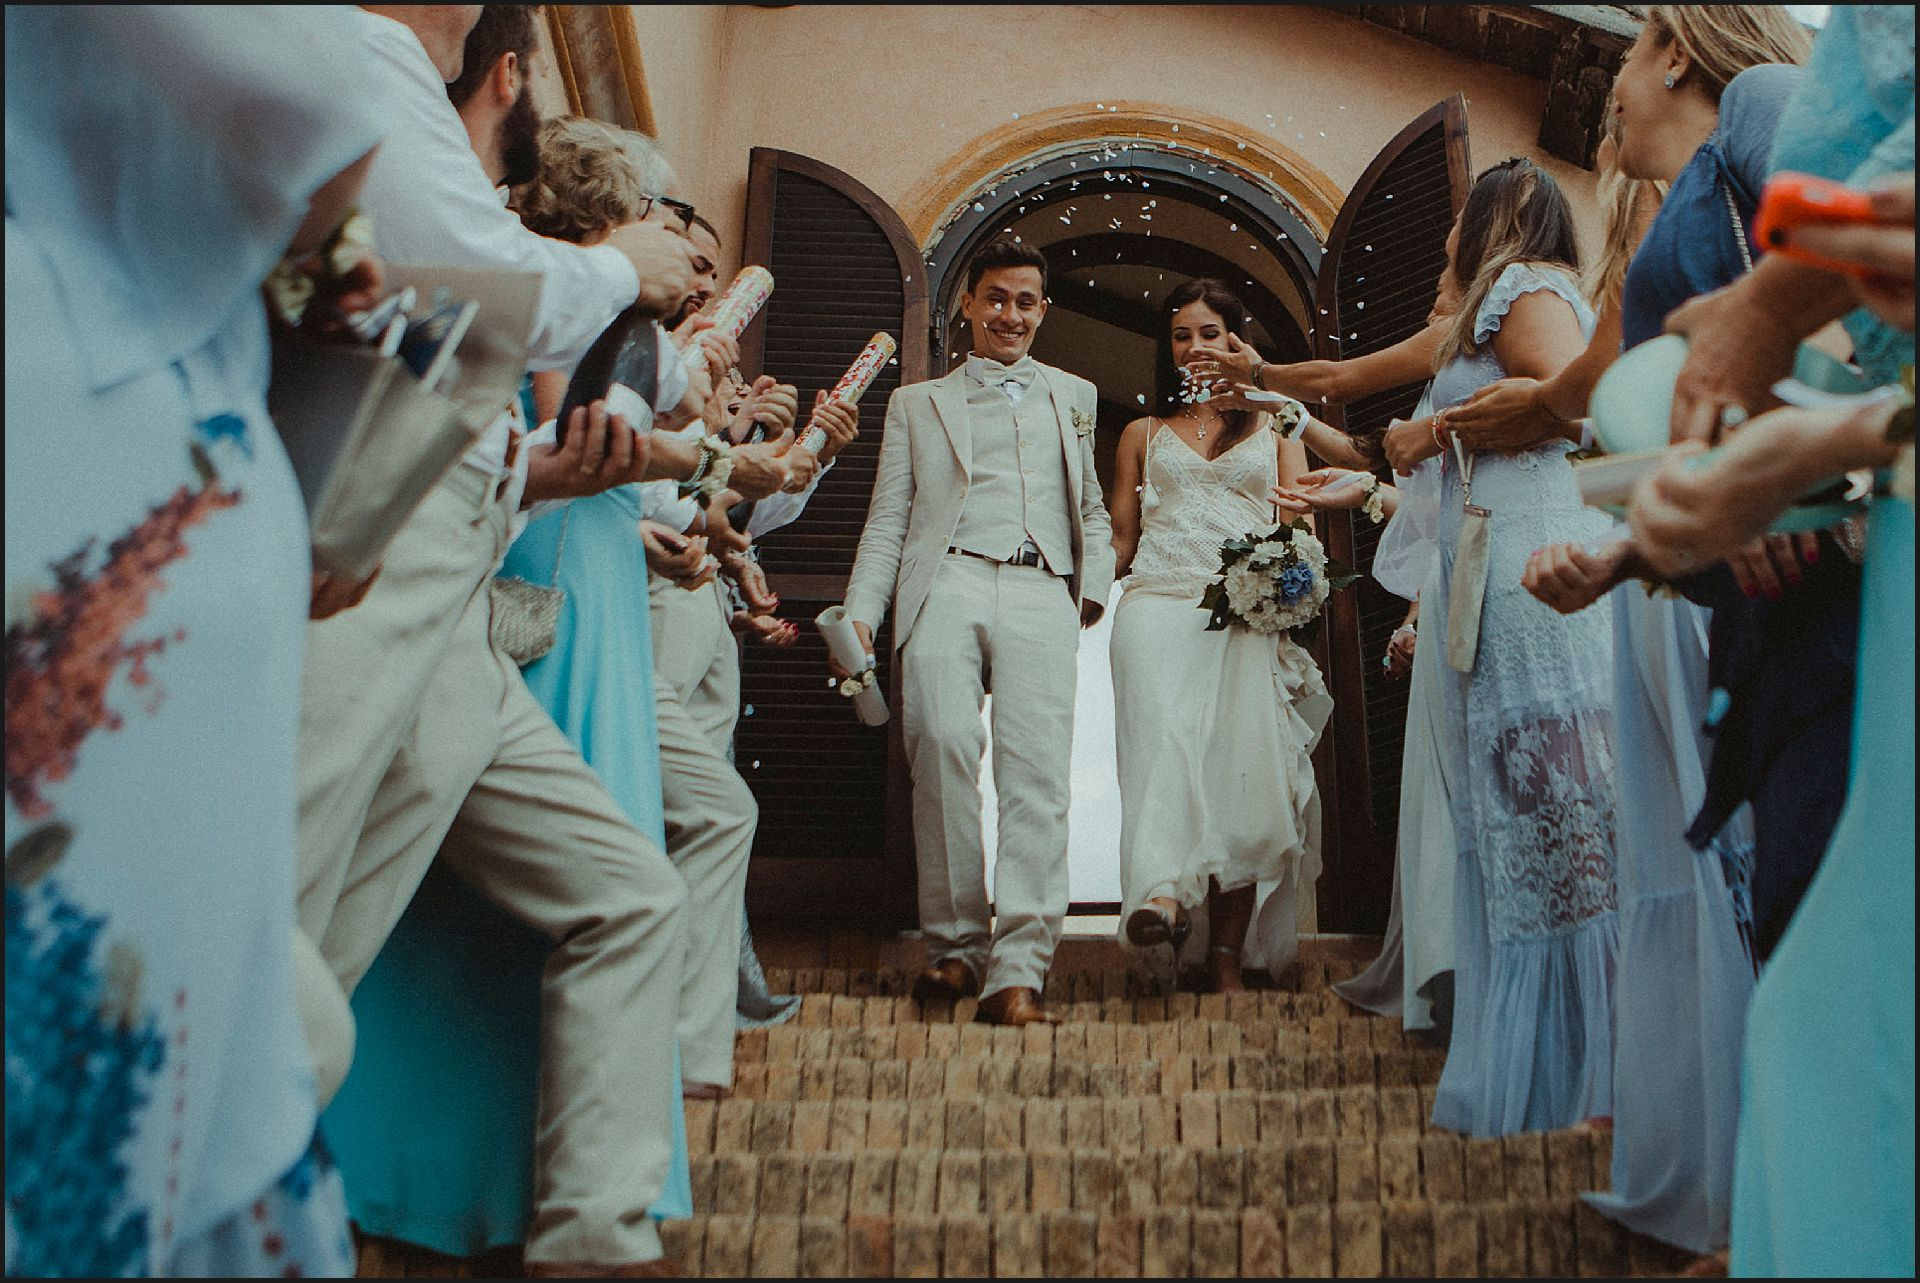 rice throwing, ceremony, friends, destination wedding, civitavecchia, rome, brazilian couple